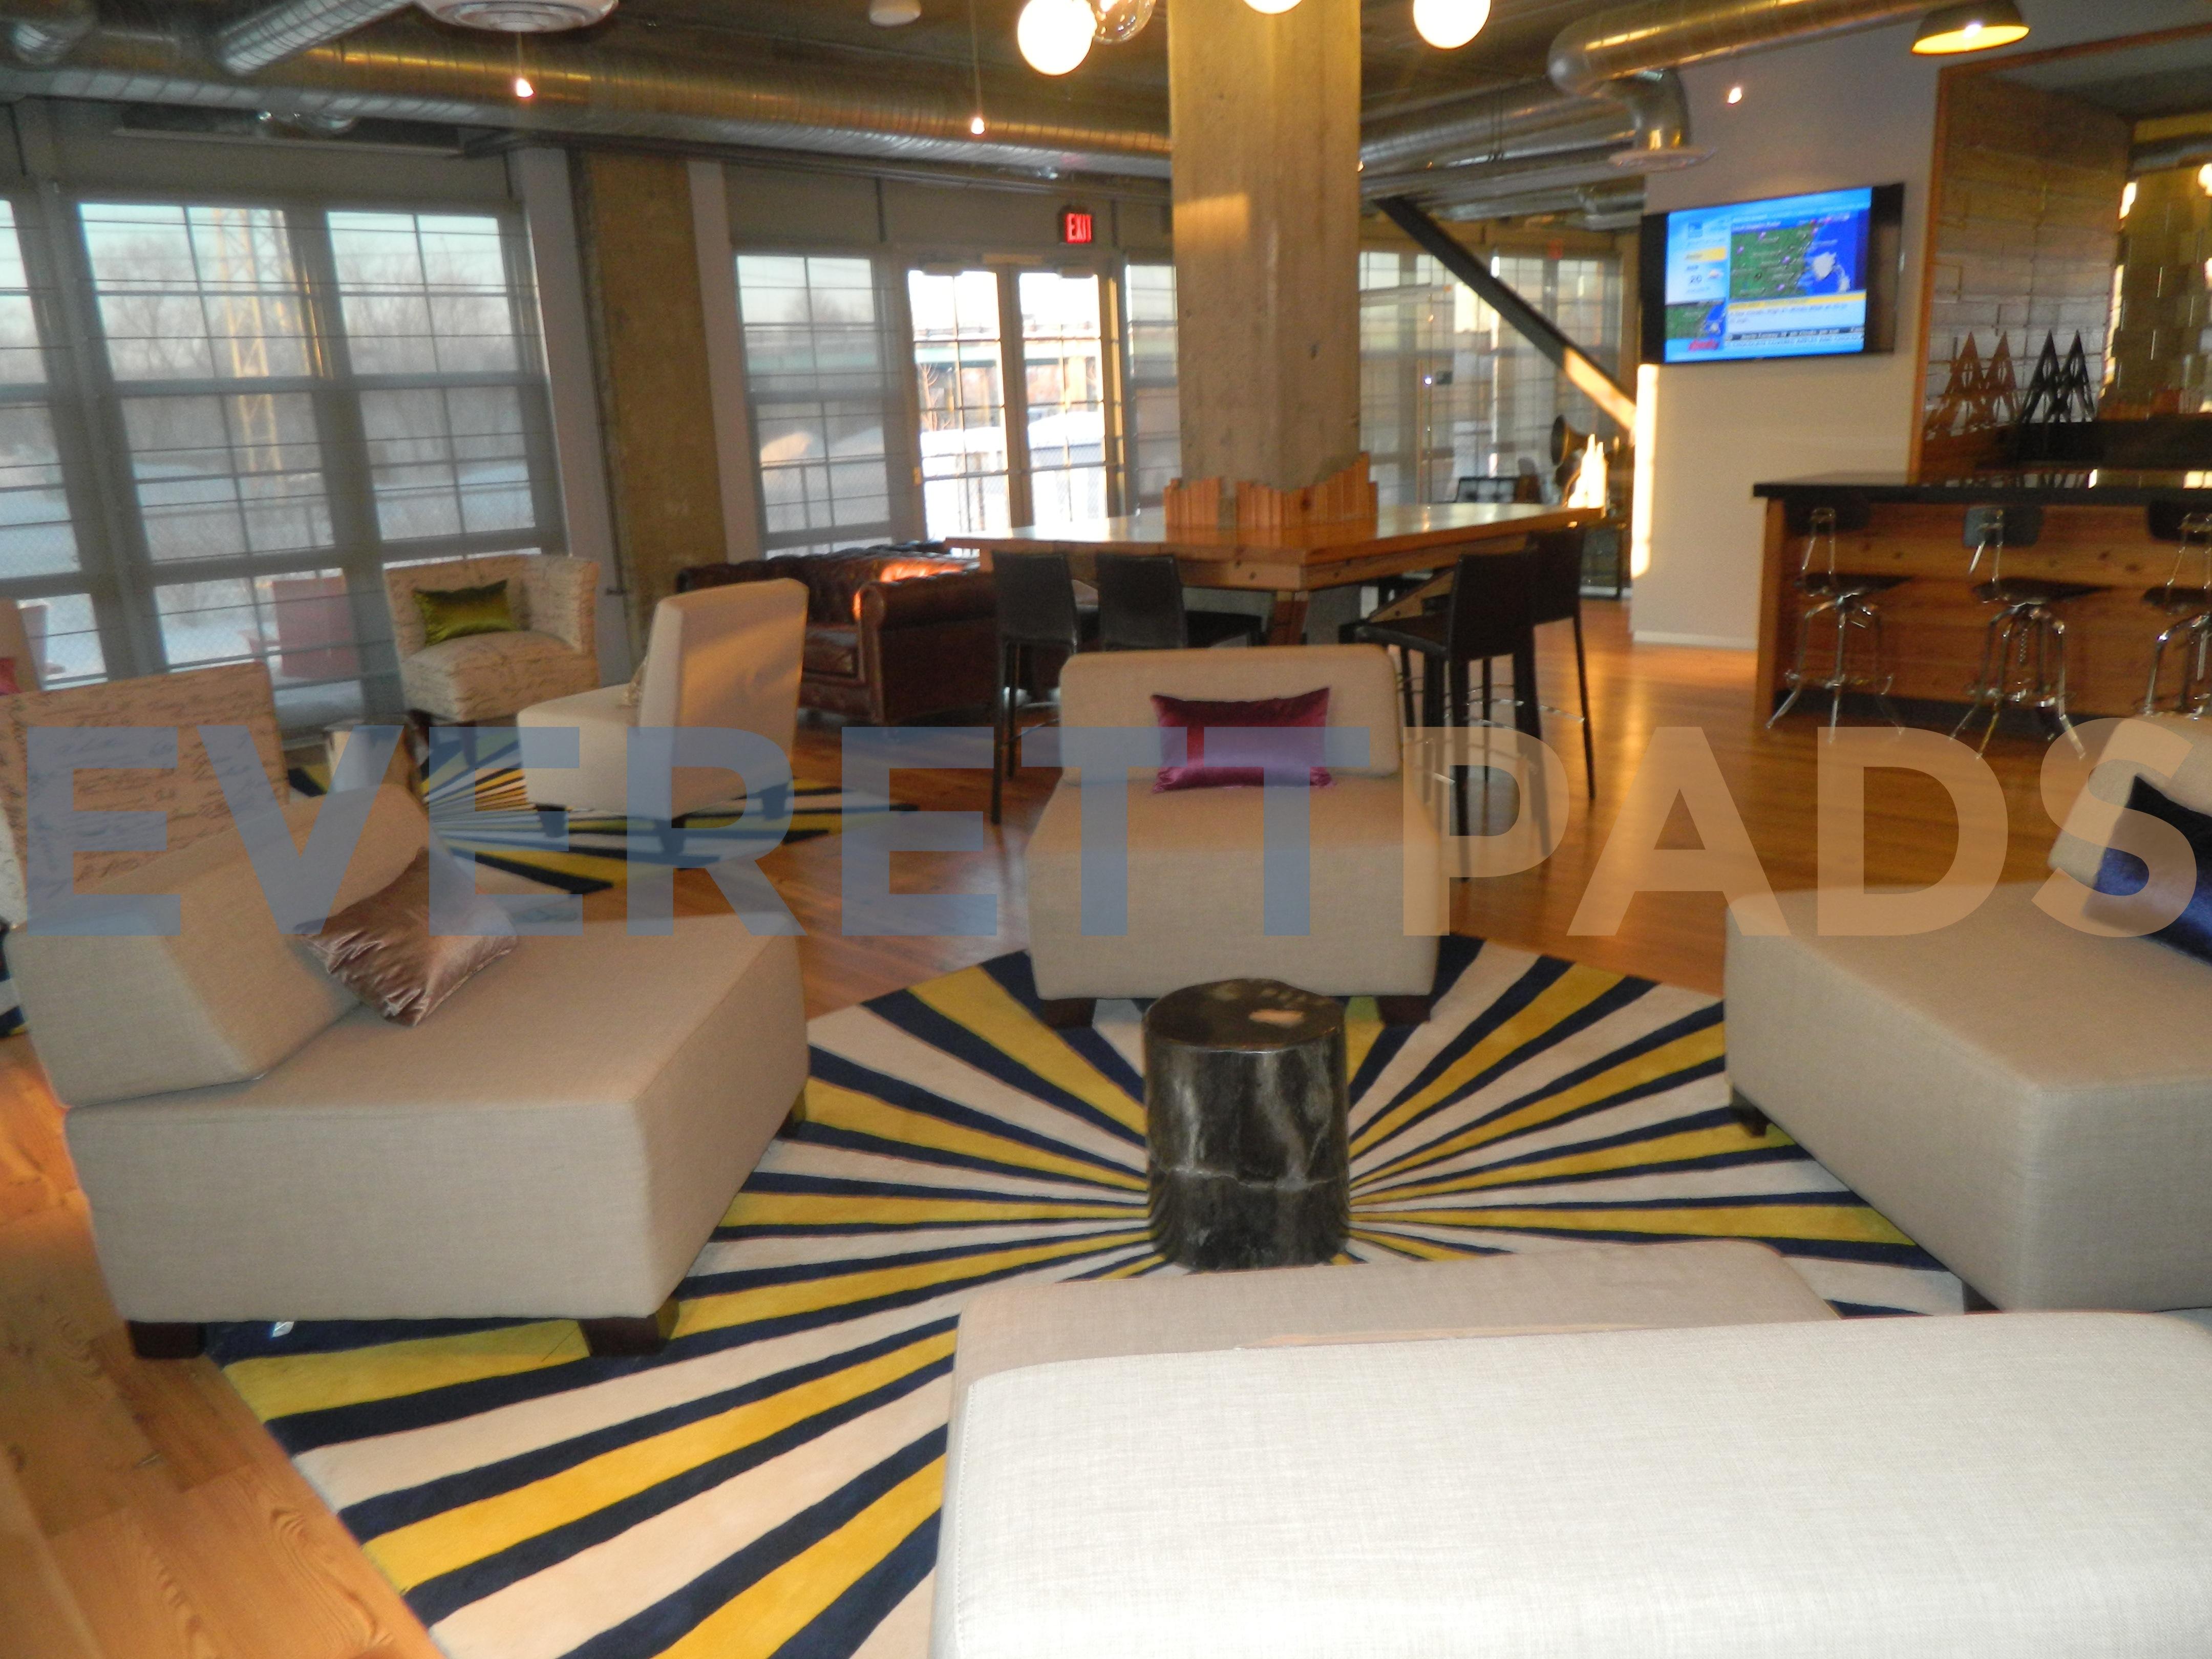 The Batch Yard resident lounge